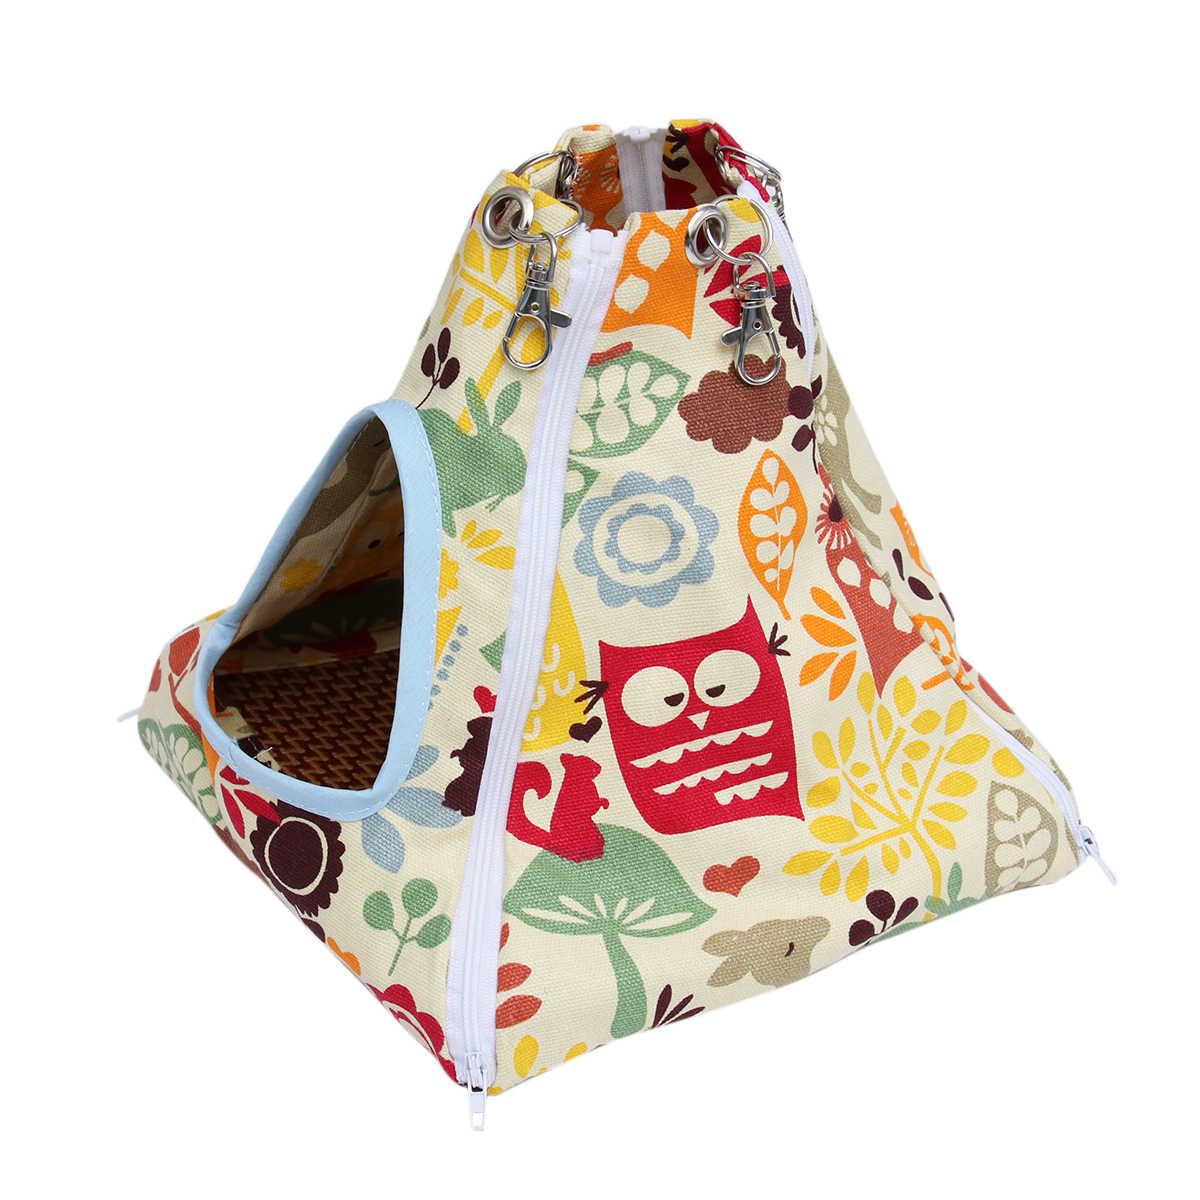 Tema do jardim zoológico Impresso Pequeno Pet Hammock Tenda-stype Ninho Pet Casa para Rato Hamster Ferret Coelho Esquilo Hanging Bed brinquedos do papagaio